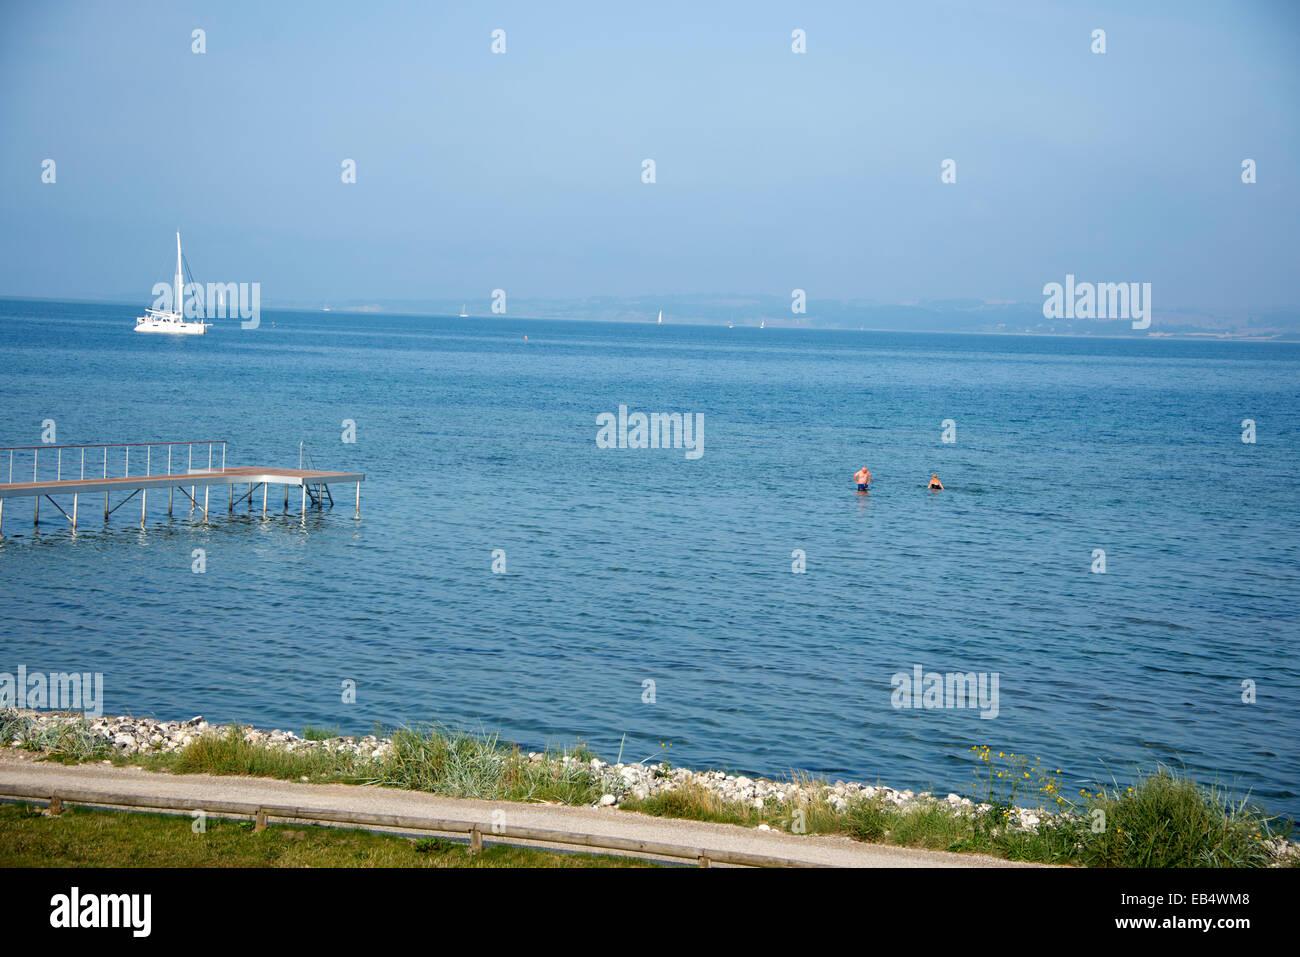 Two swimmers in the Kattegat Sea at Ebeltoft in East Jutland,Denmark - Stock Image